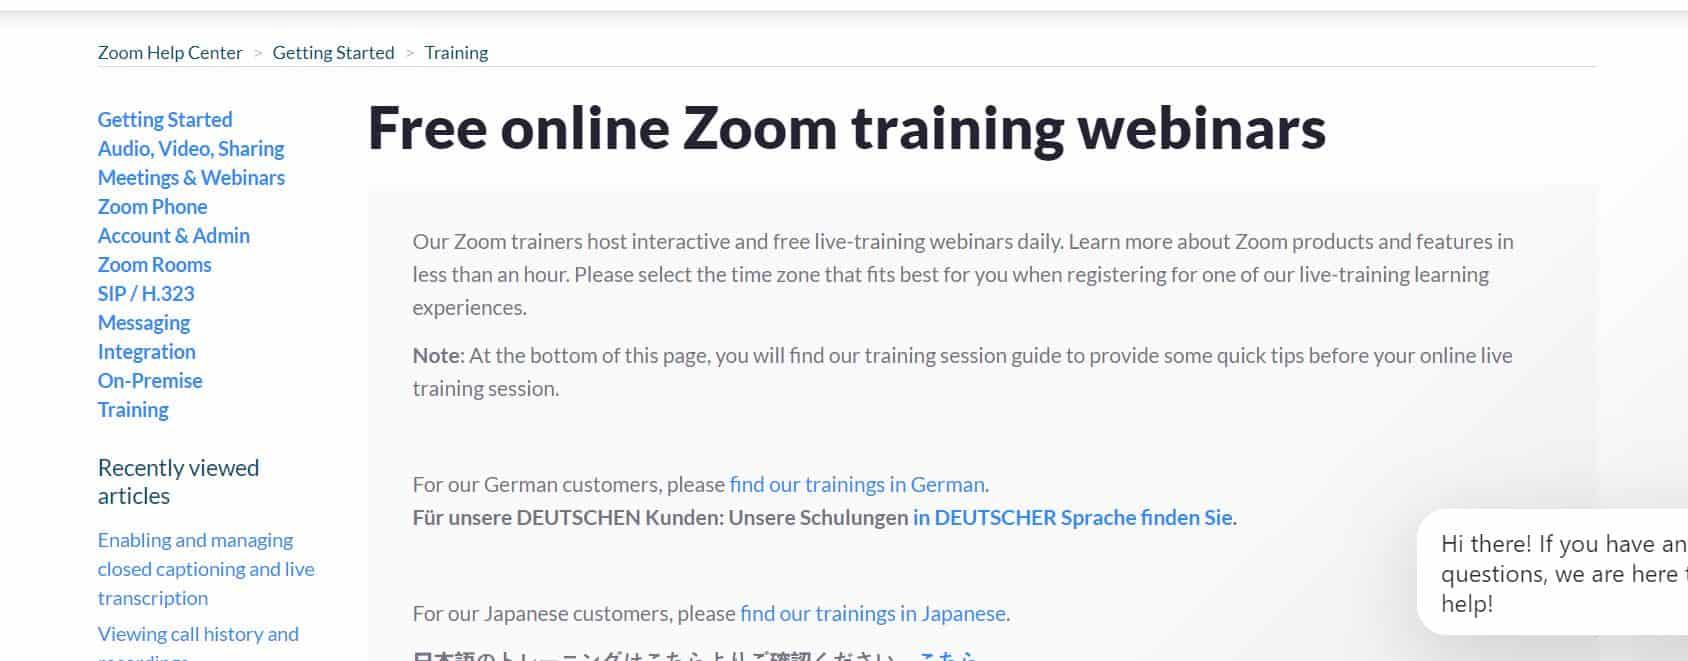 Zoom trains its users via webinars